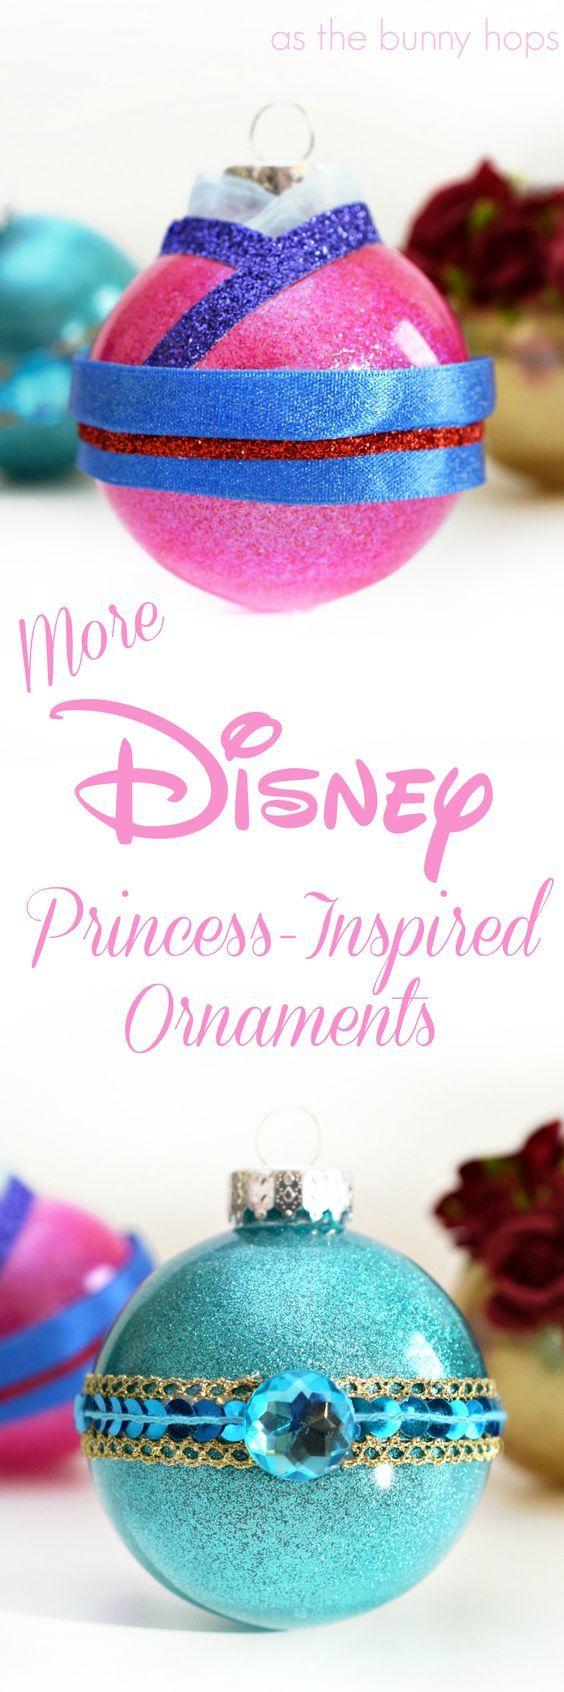 More Disney Princess-Inspired Christmas Ornaments | Ornament, Craft ...